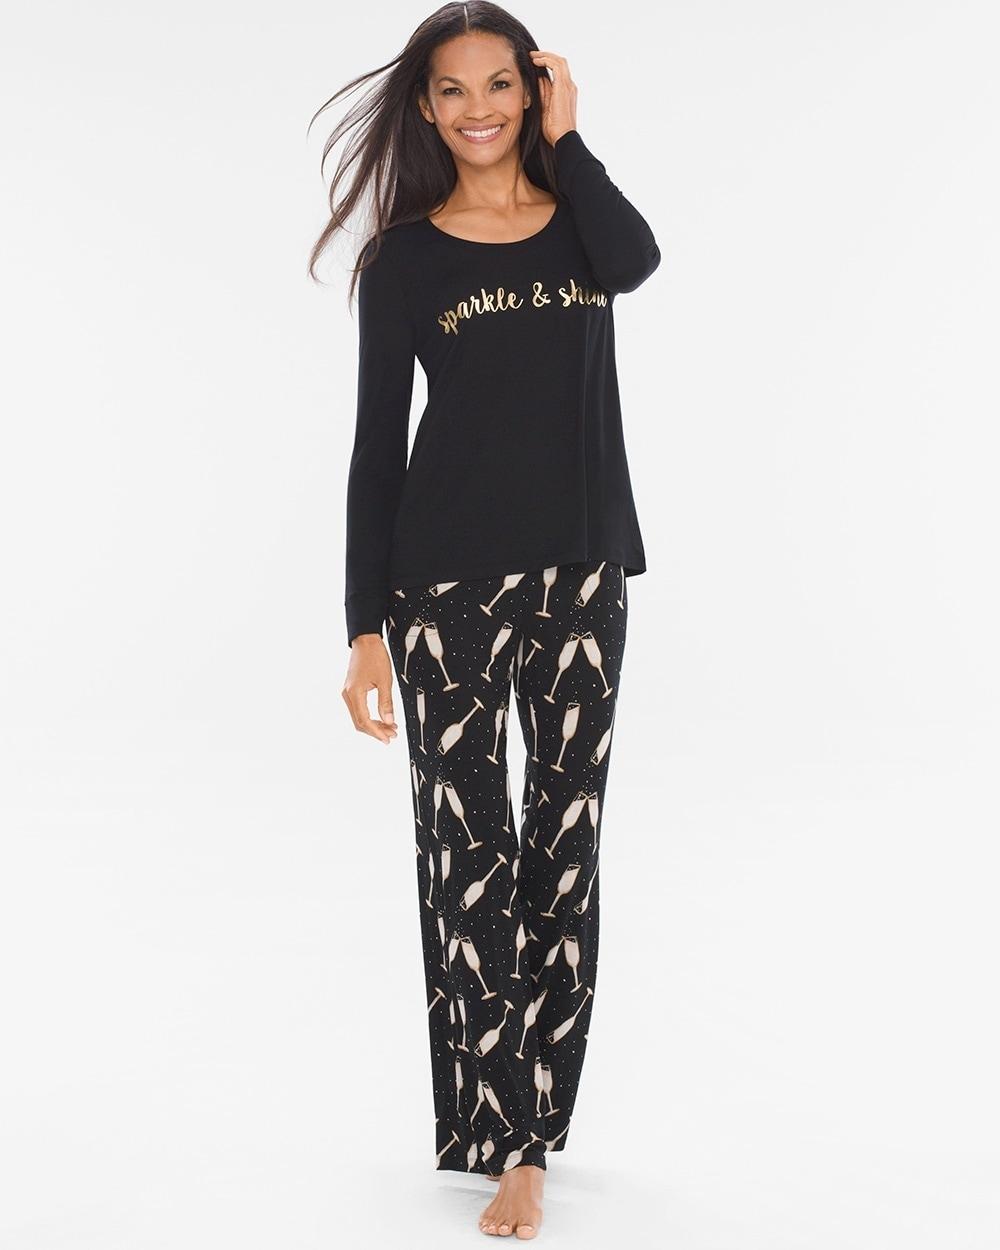 Shop Pajama Sets for Women - Sleepwear for Women - Soma